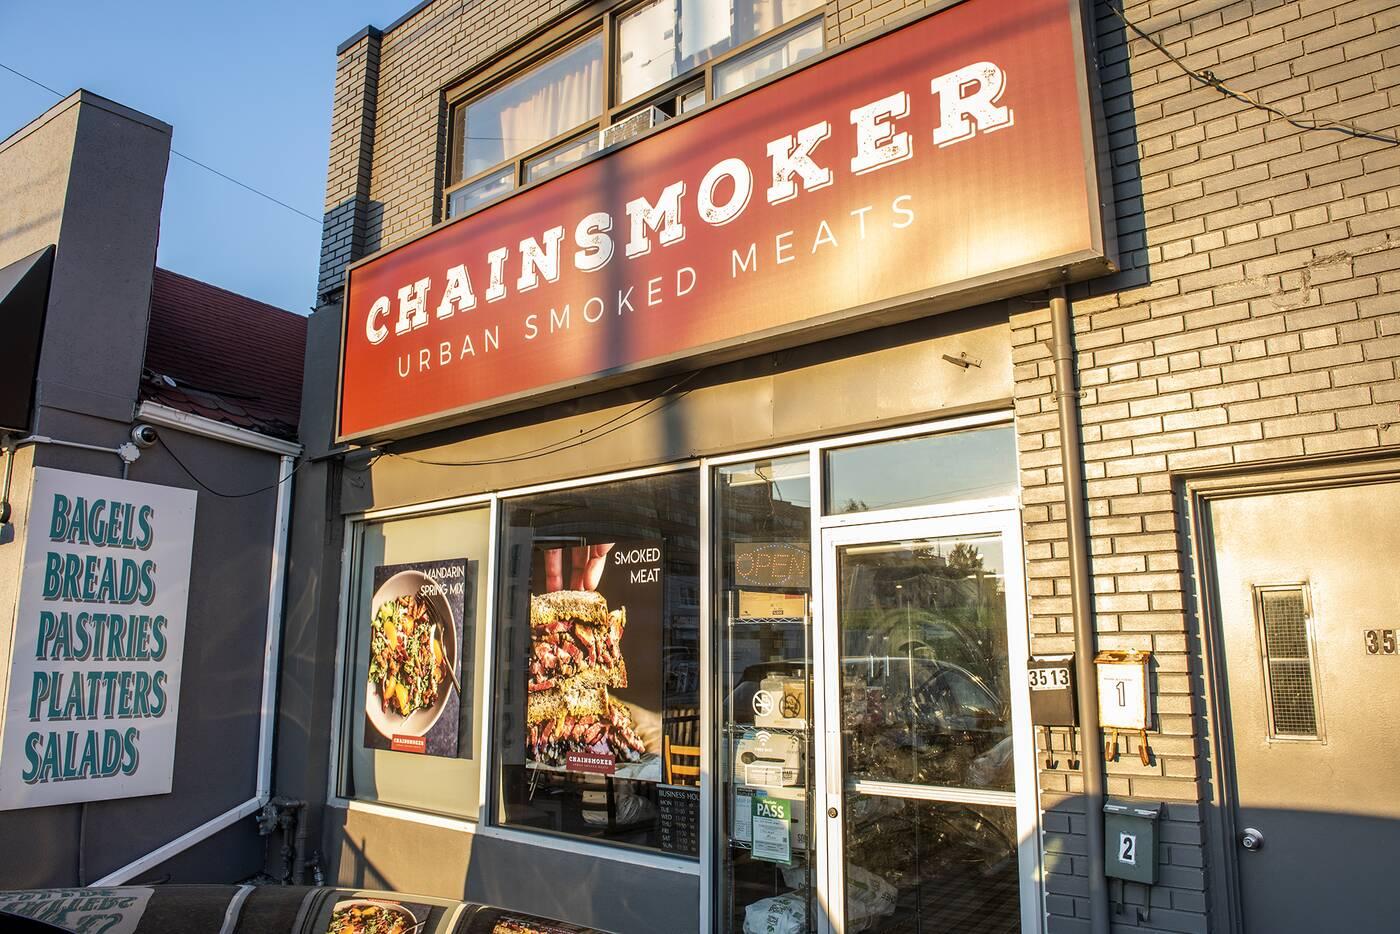 Chainsmoker Toronto